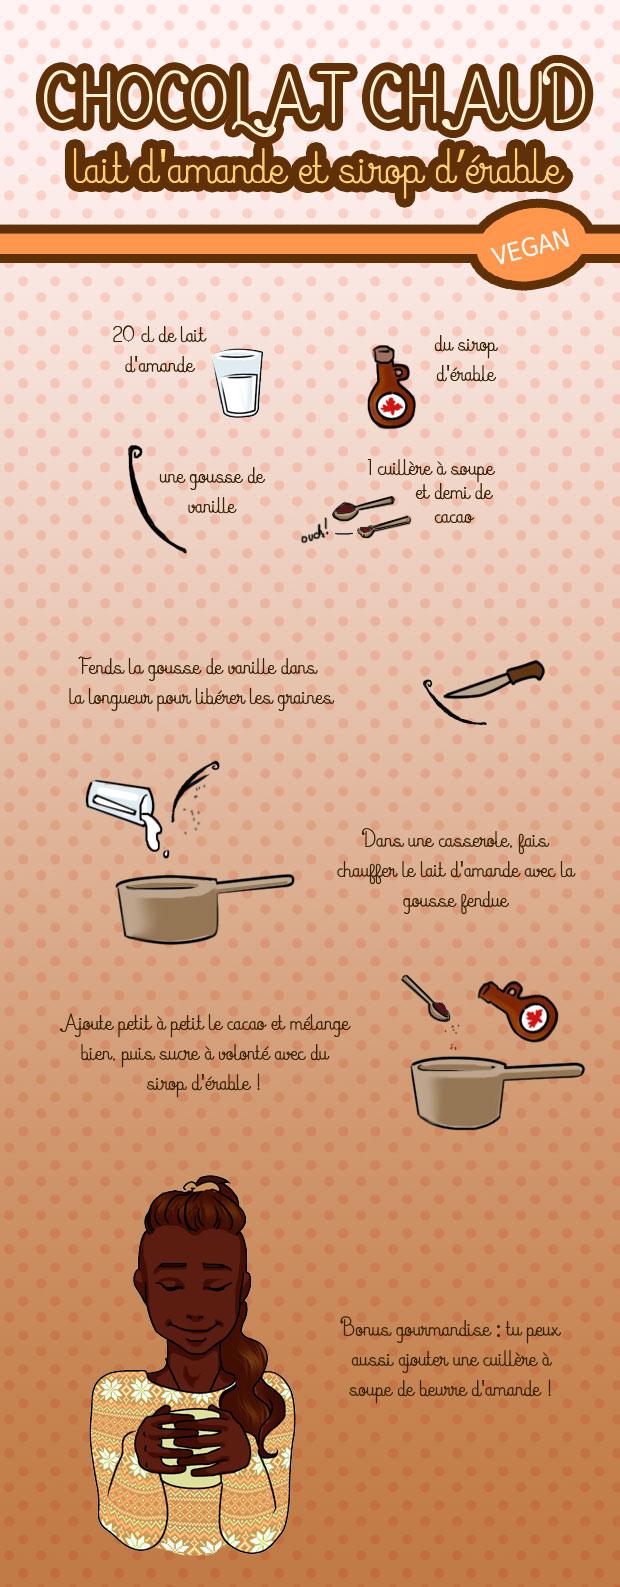 recette_chocolatchaudvegan2